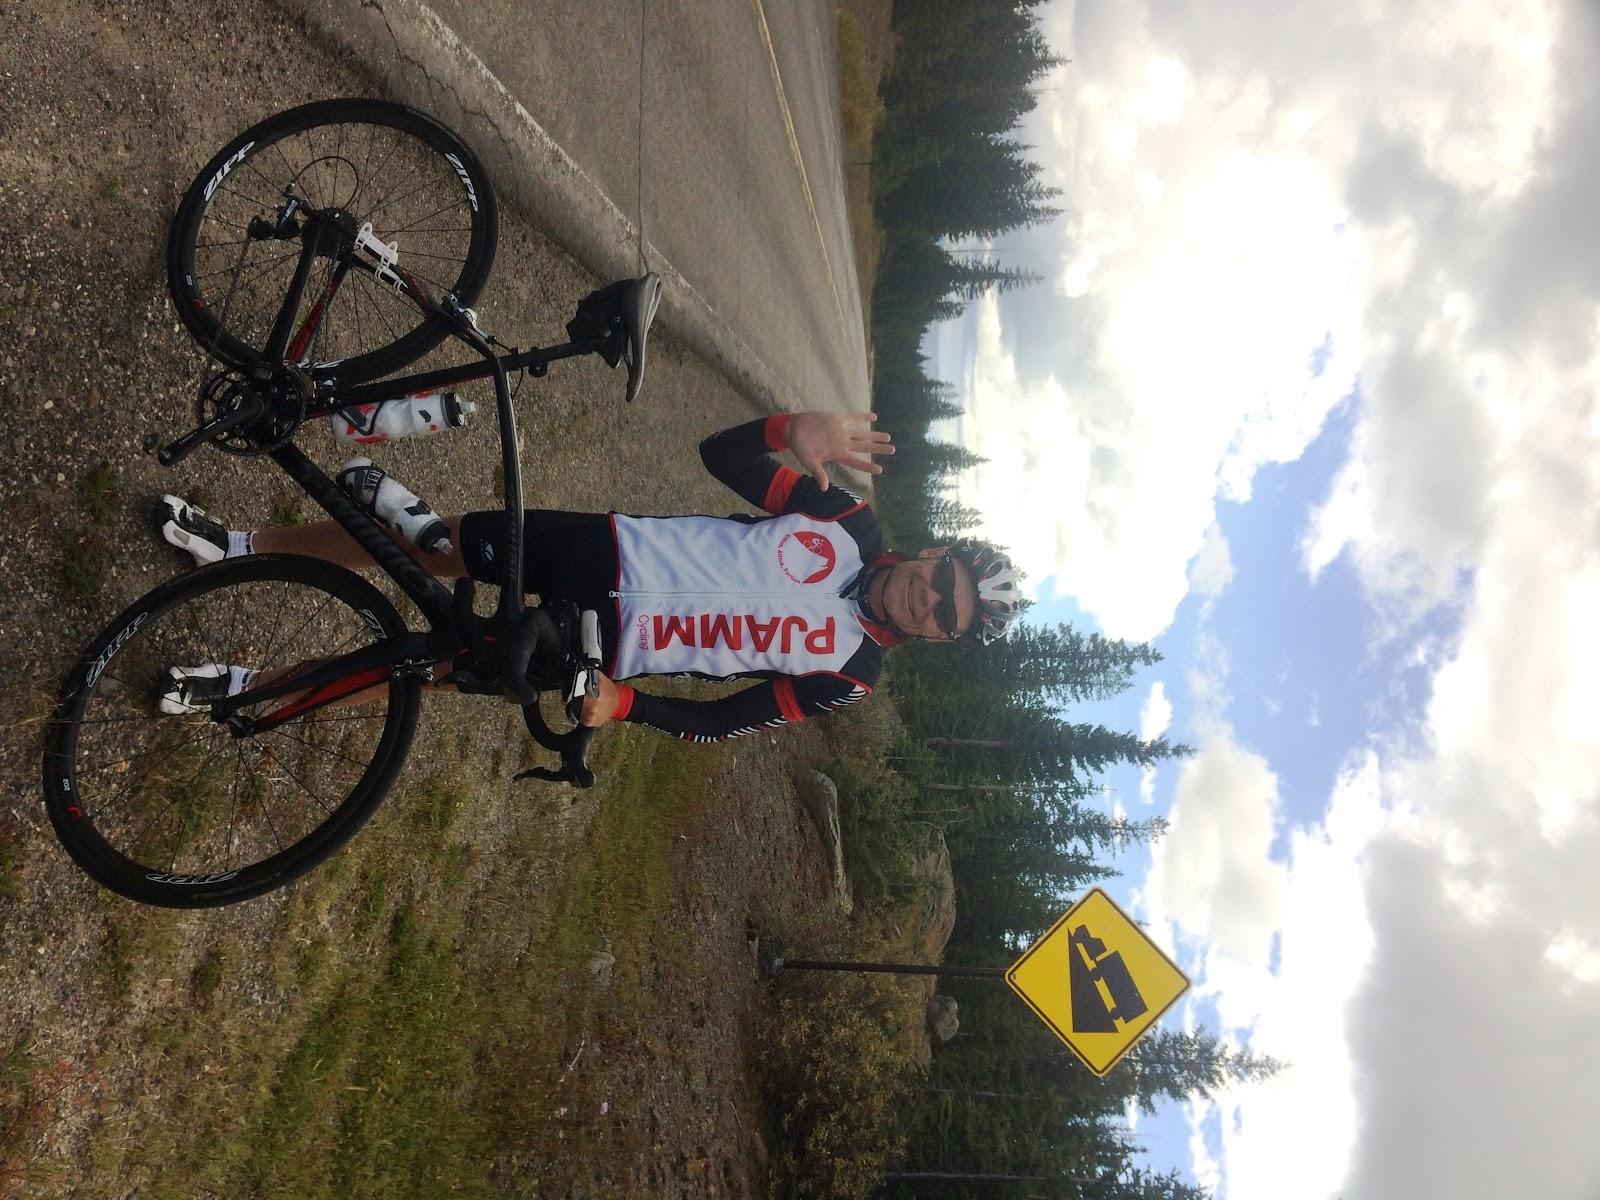 Biking to Grand Mesa North - cyclist with bike and steep grade sign